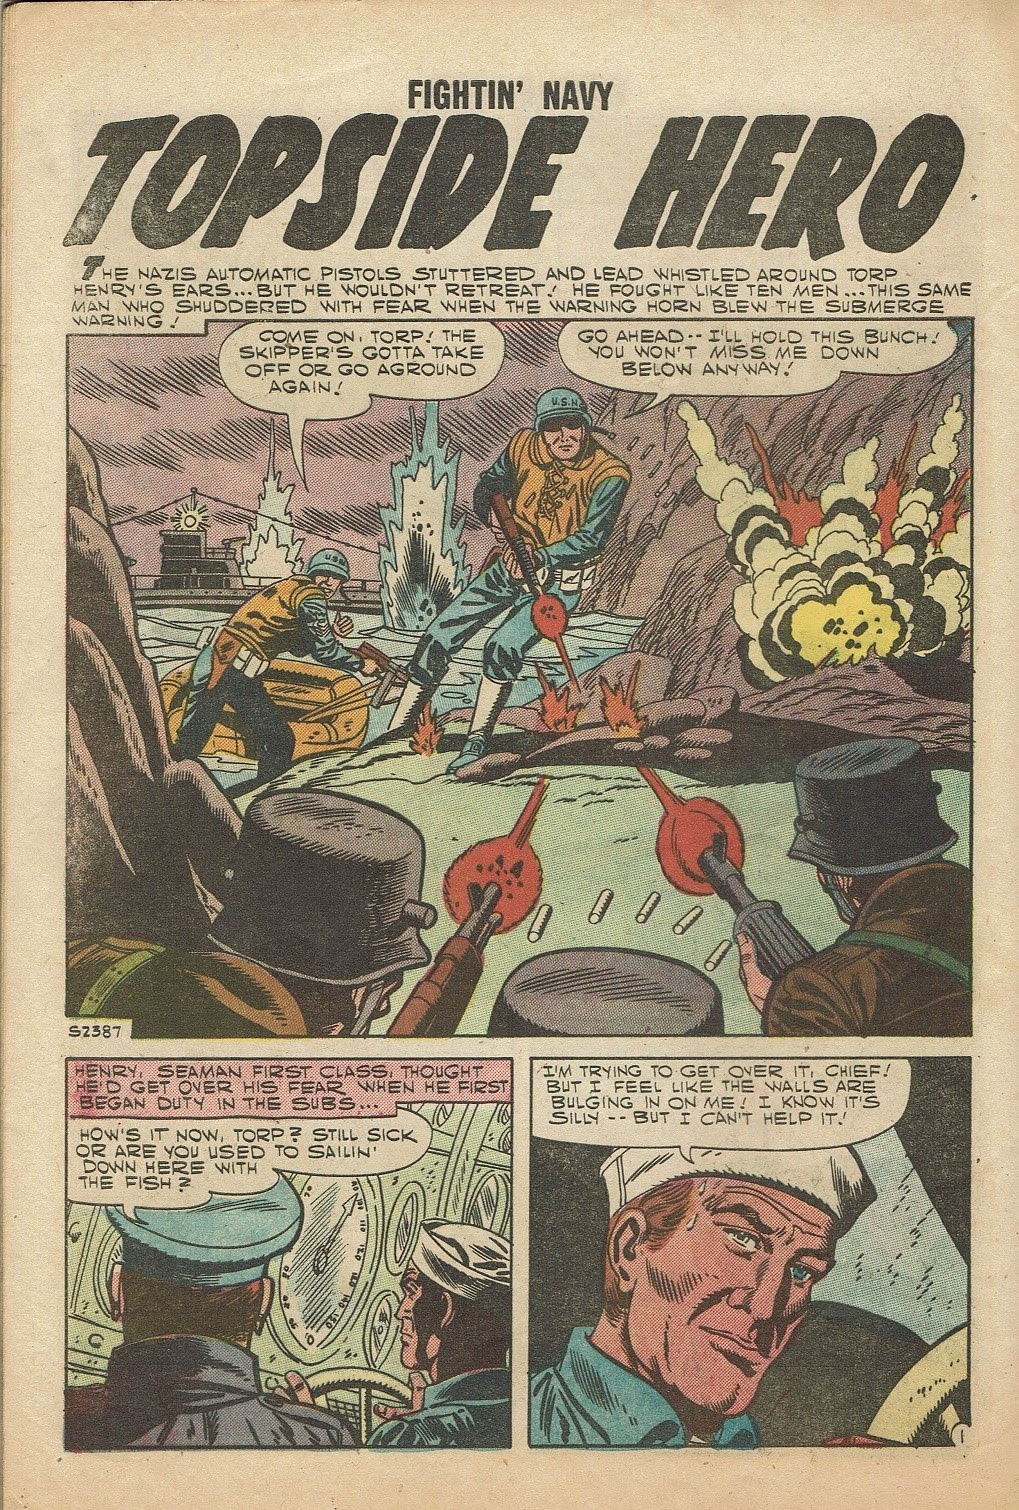 Read online Fightin' Navy comic -  Issue #81 - 28